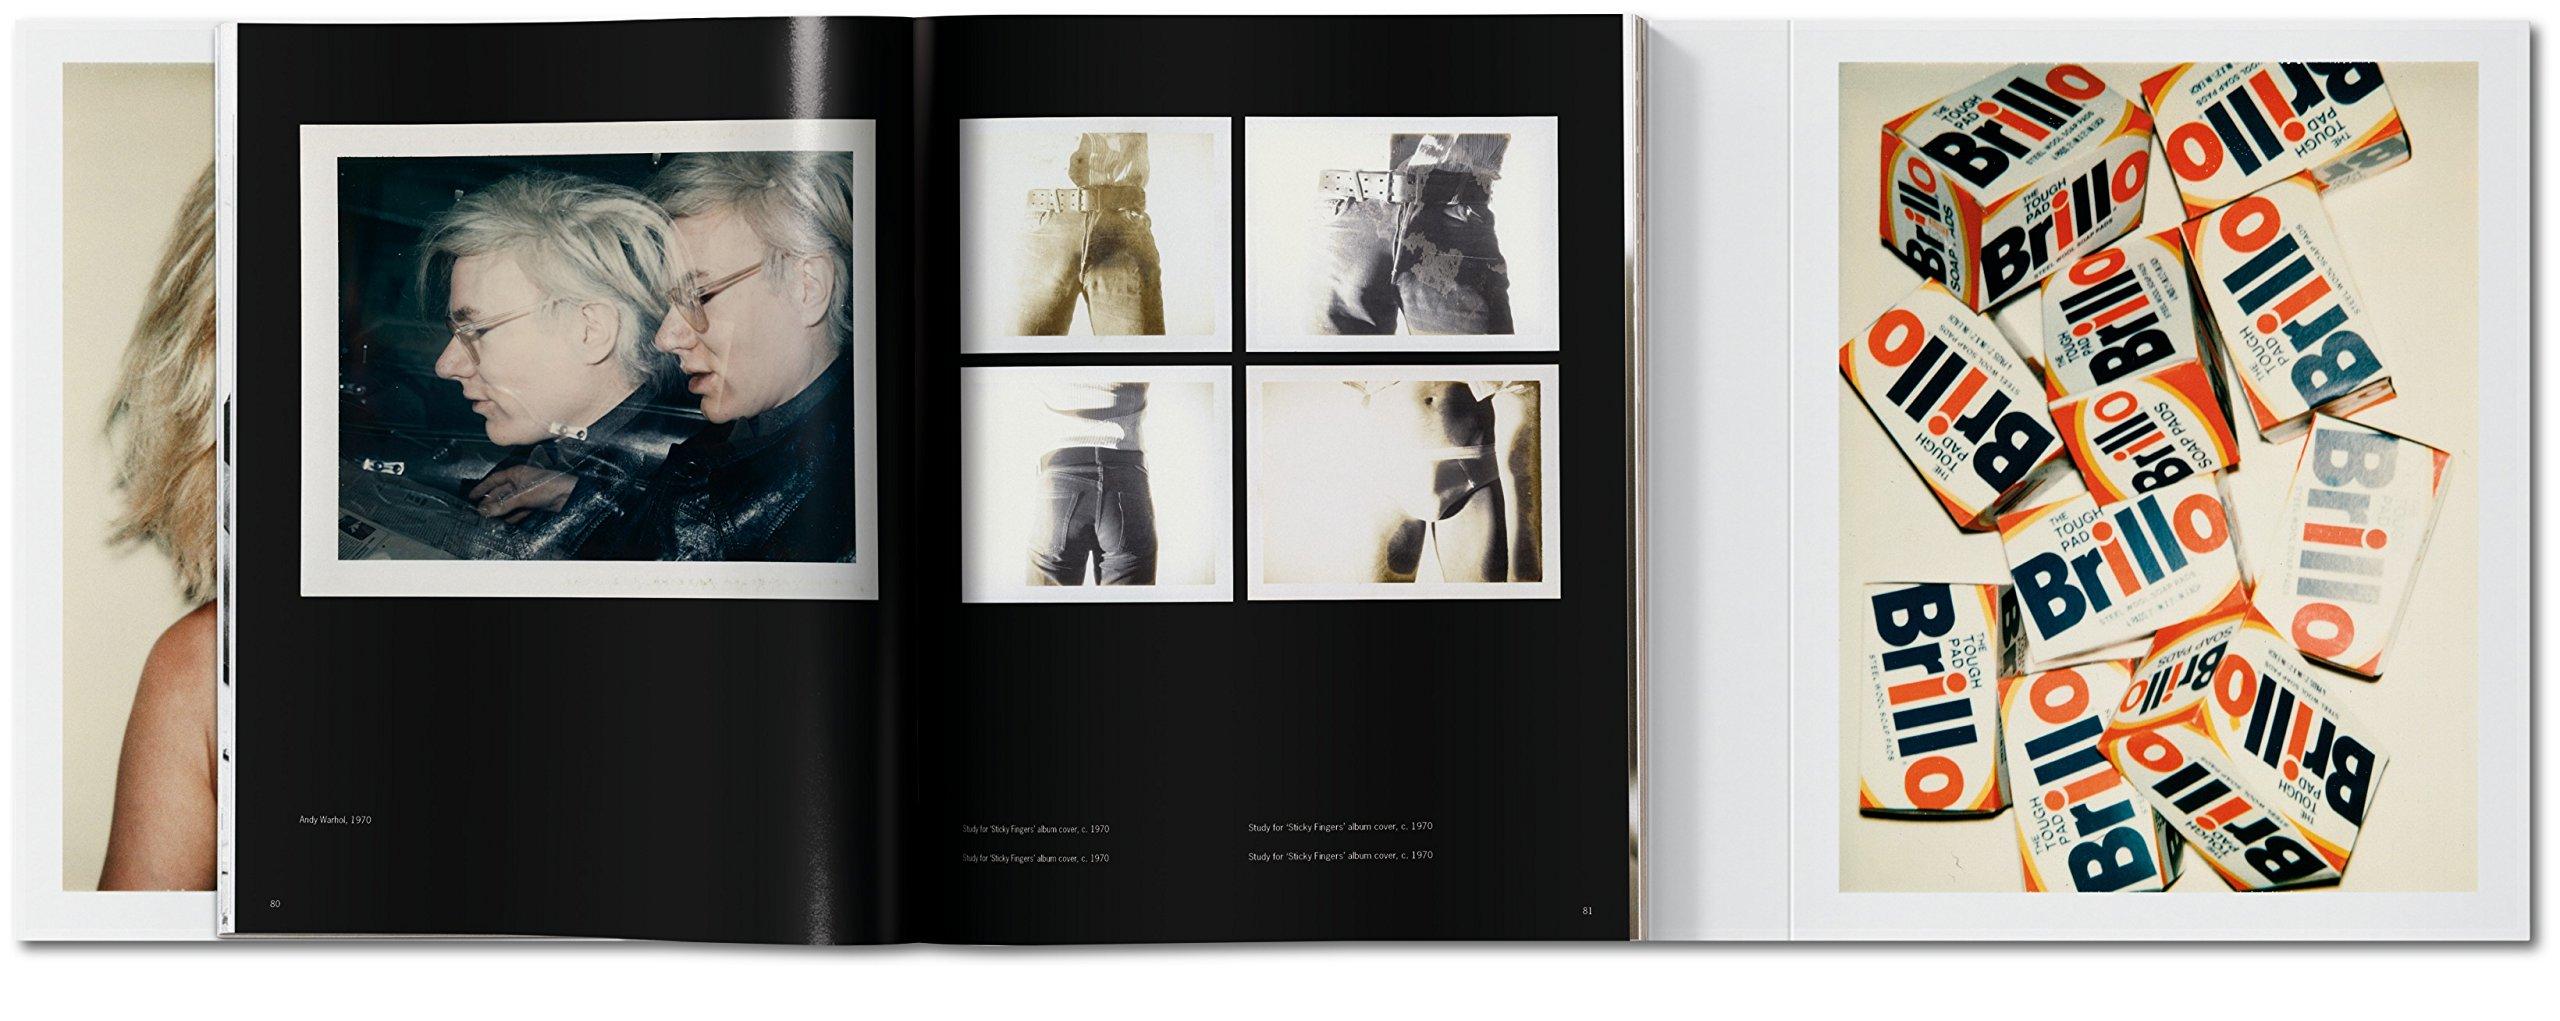 35bdc6373c256 Andy Warhol  Polaroids 1958-1987  Amazon.it  Meredith Mendelsohn, Reuel  Golden, Richard B. Woodward  Libri in altre lingue